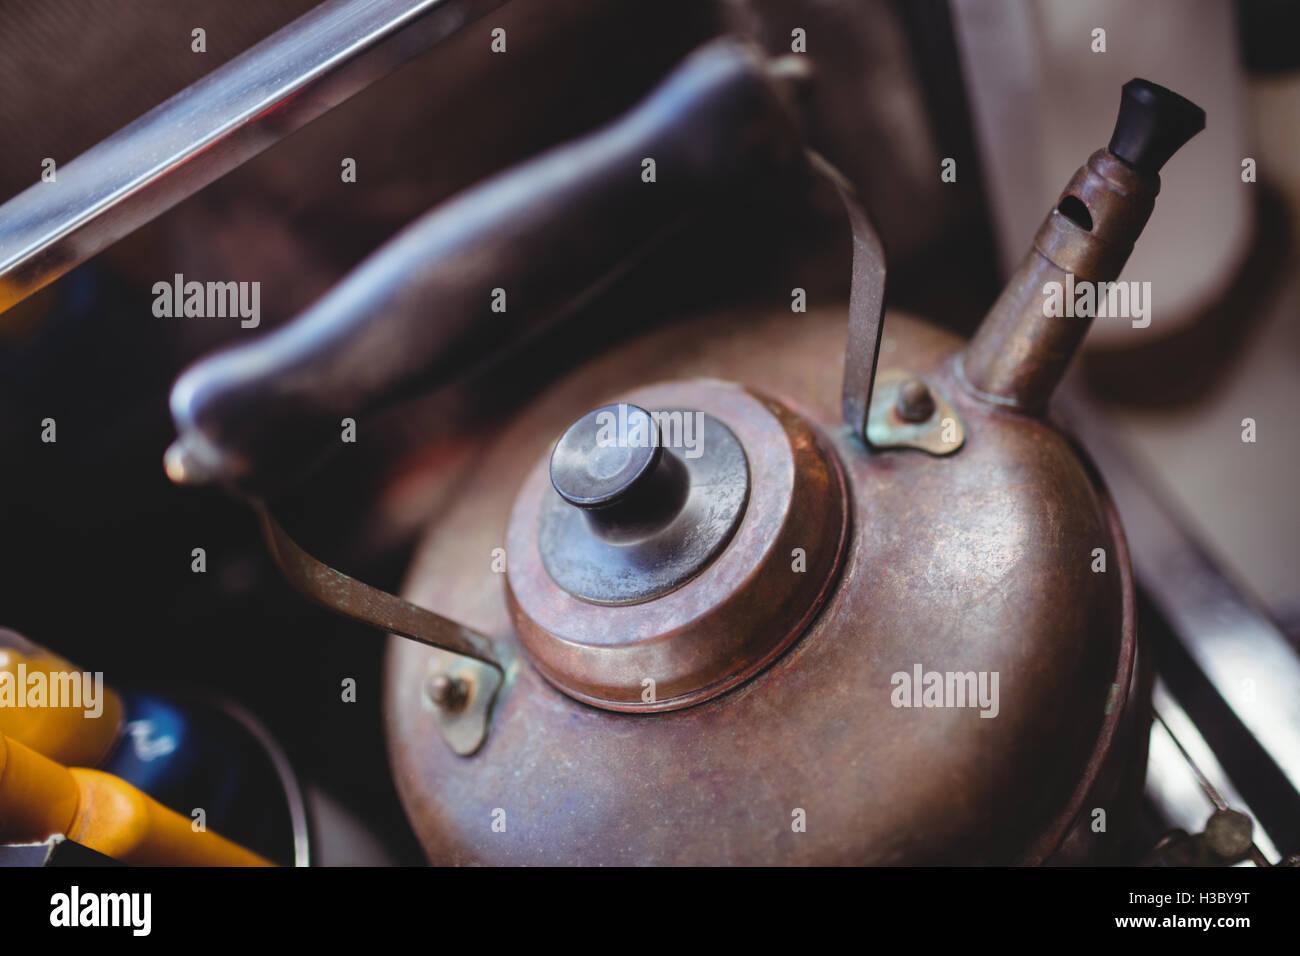 Tea kettle on gas stove - Stock Image